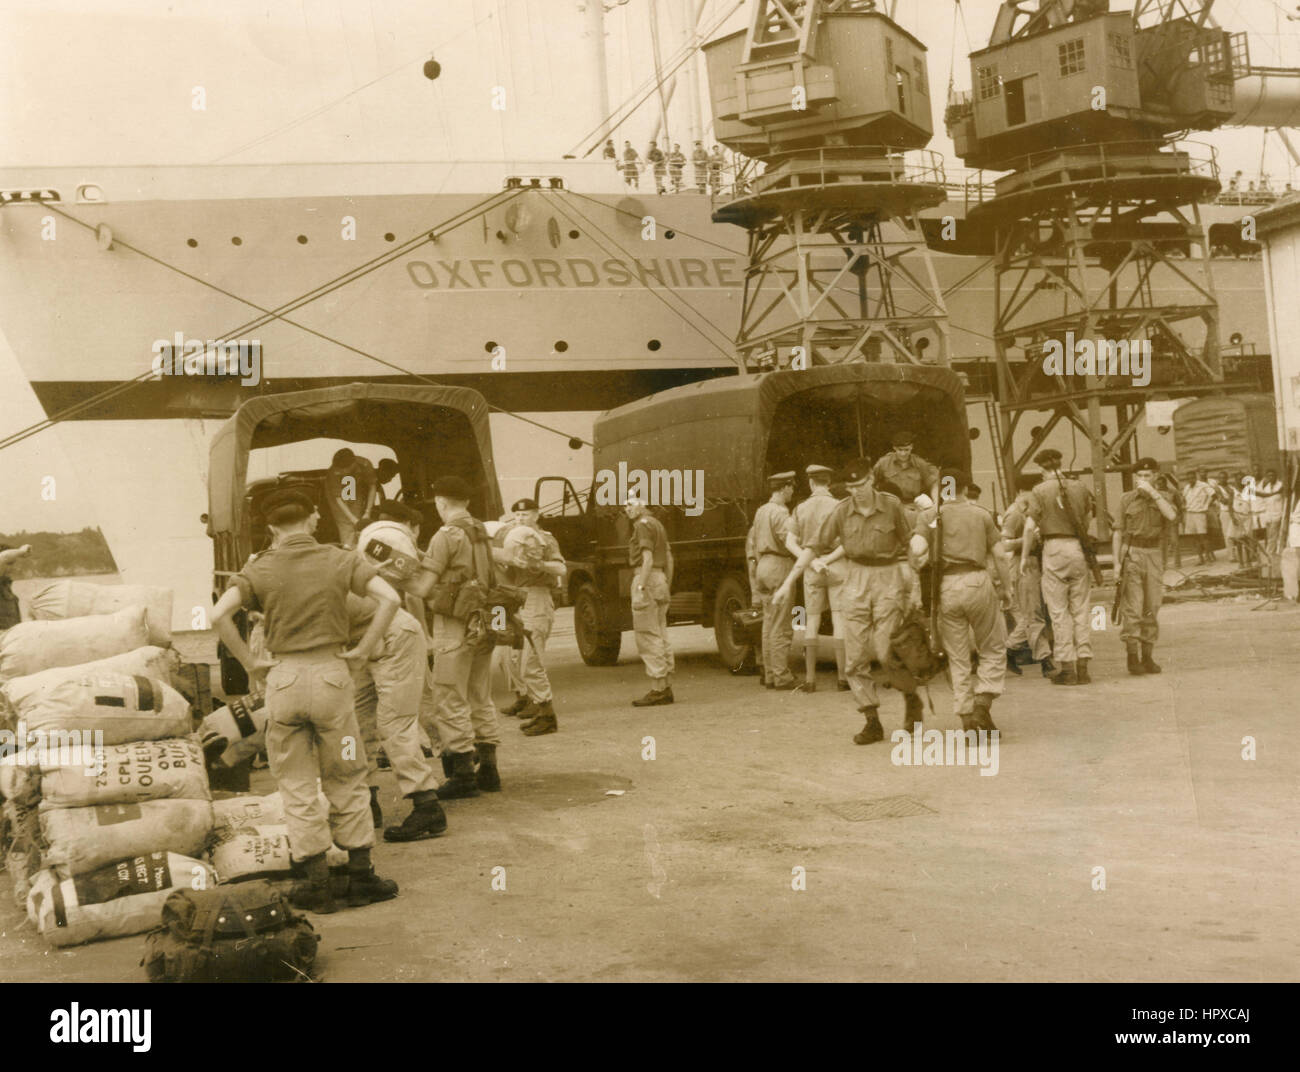 British Gordon Highlanders troop disembarking from the ship Oxfordshire, Mombasa, Kenya 1961 - Stock Image